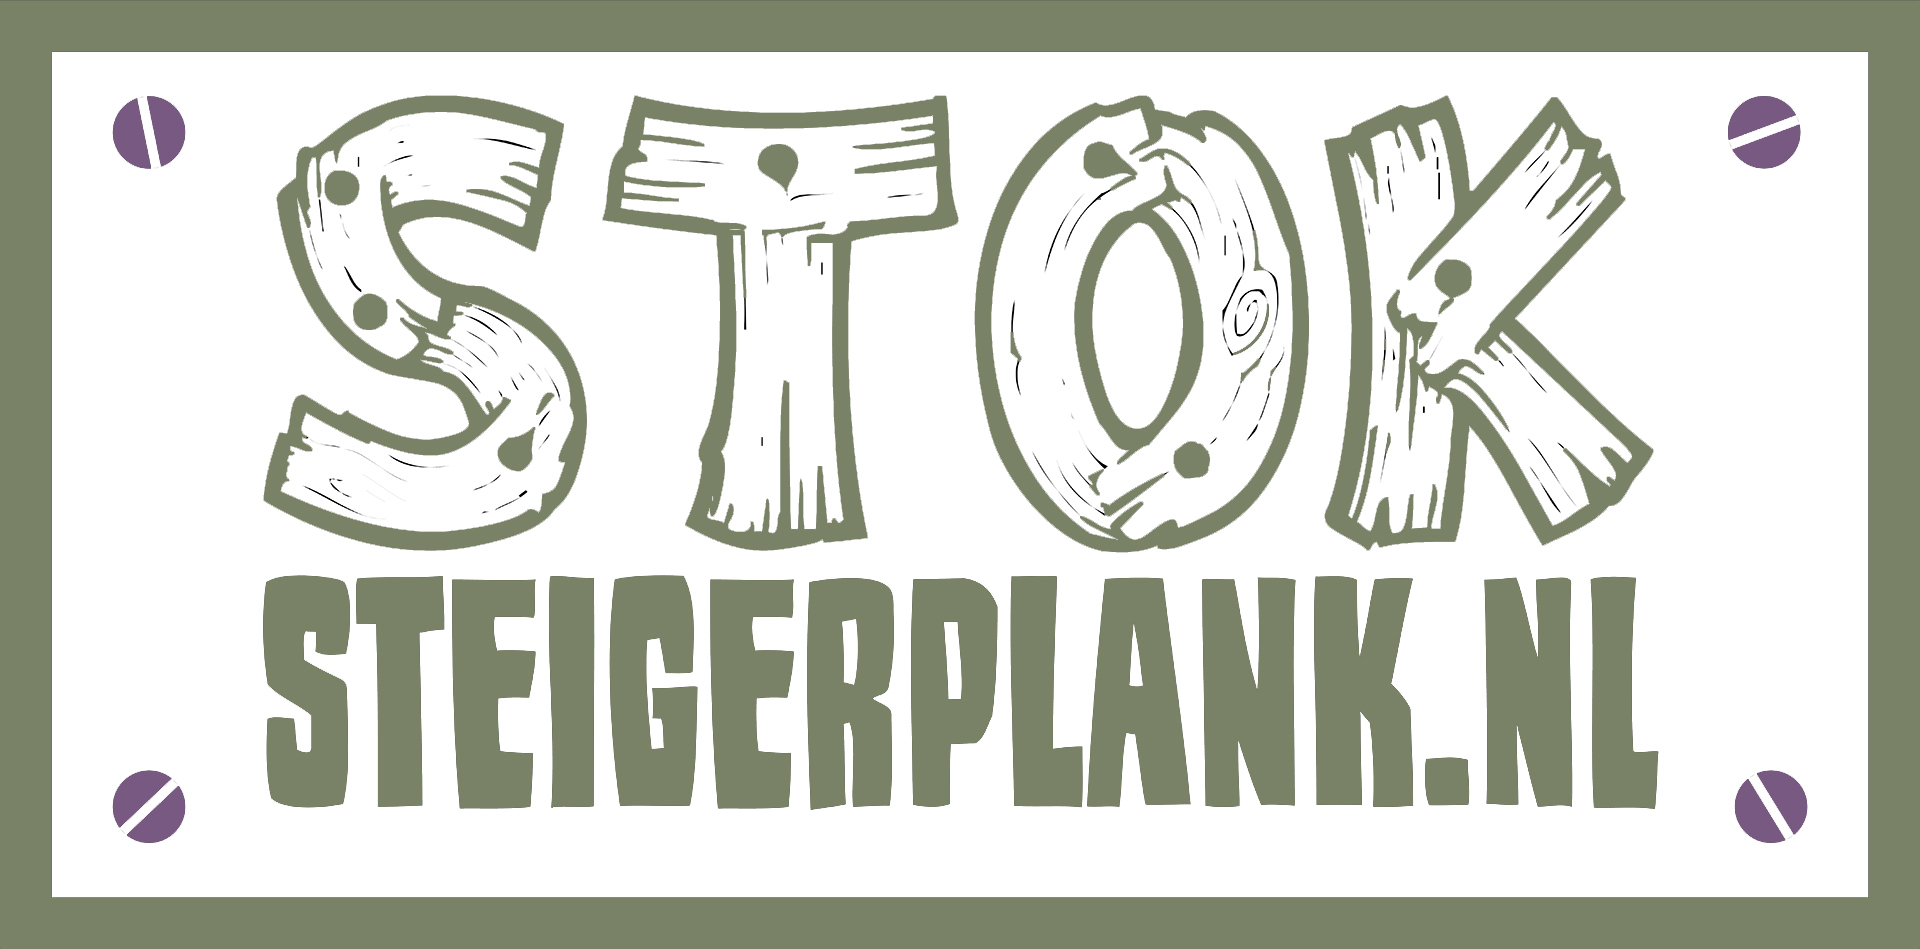 Stoksteigerplank-logonieuw111